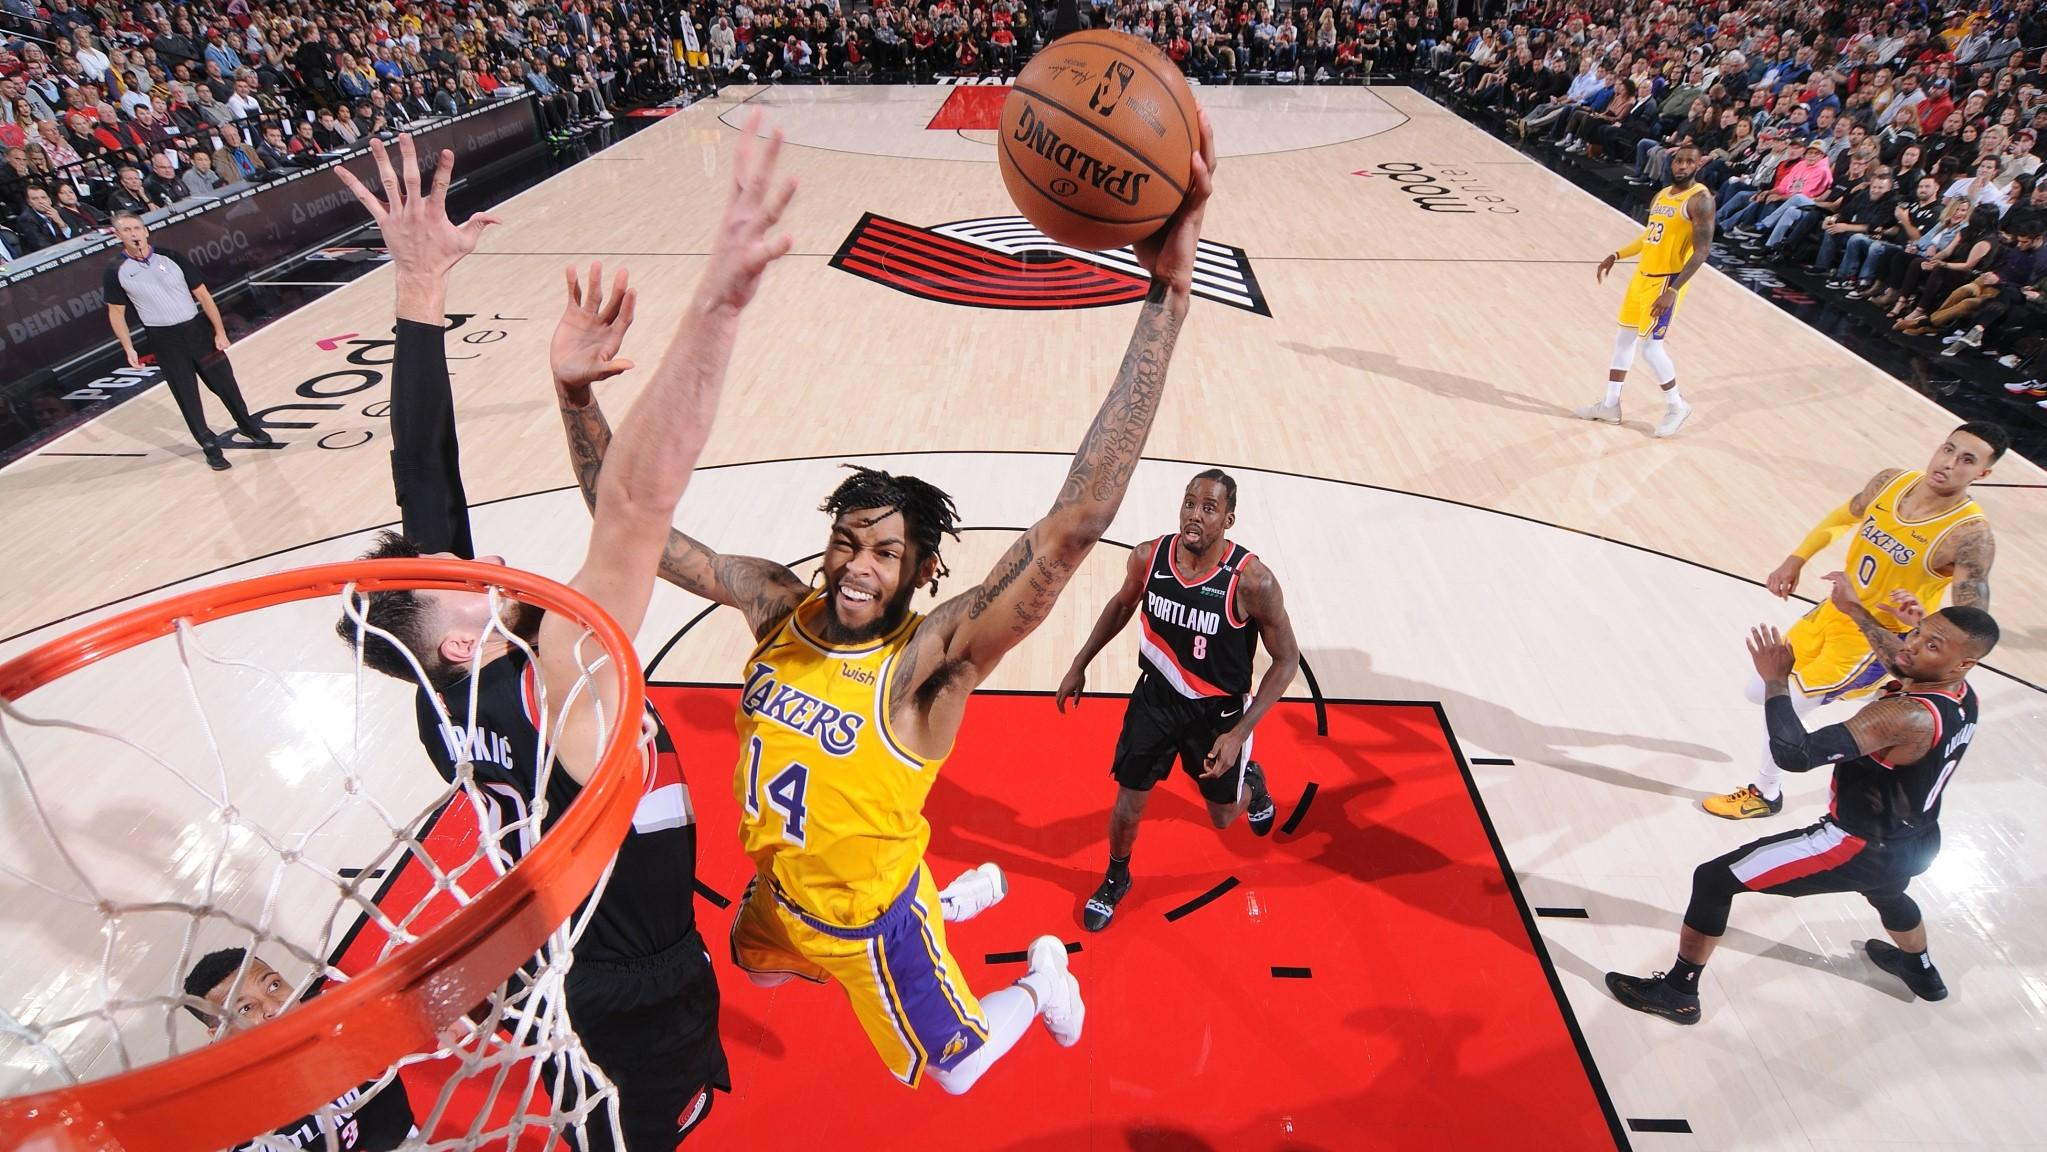 cb431ee2ad4b NBA highlights on Nov. 3  Lakers end losing streak to Trail Blazers ...